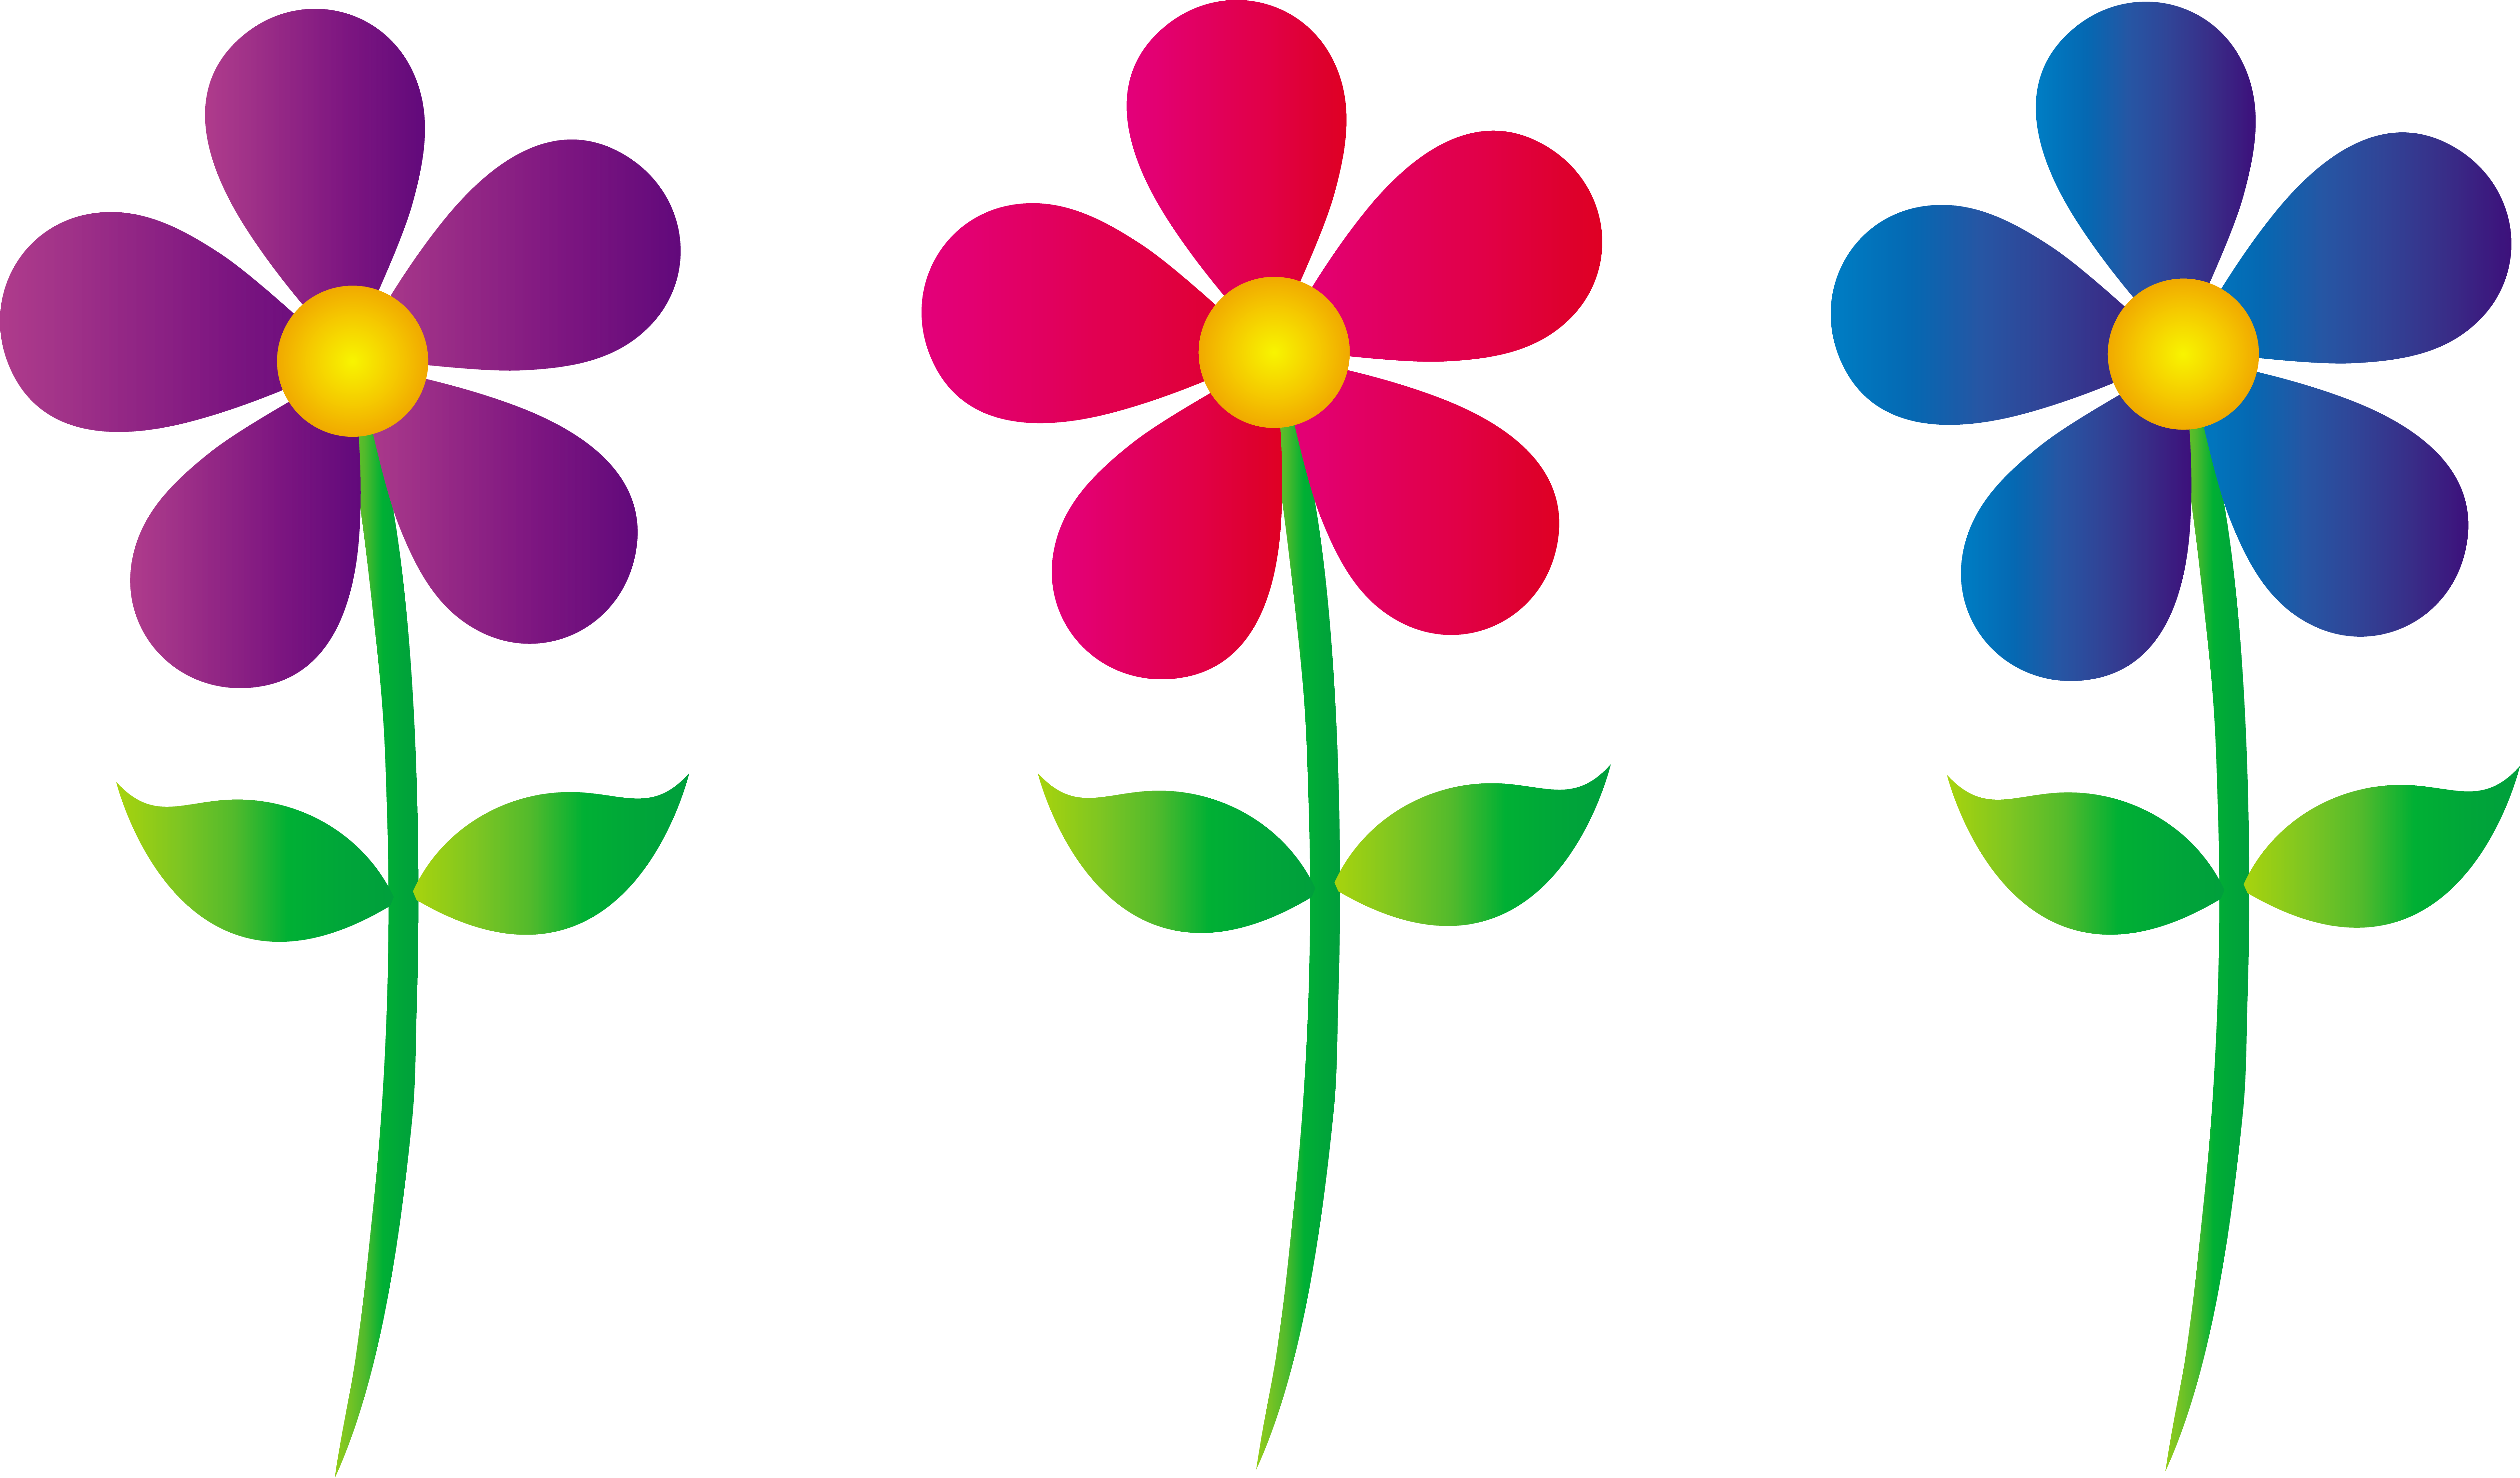 7747x4545 Flowers Clip Art Free